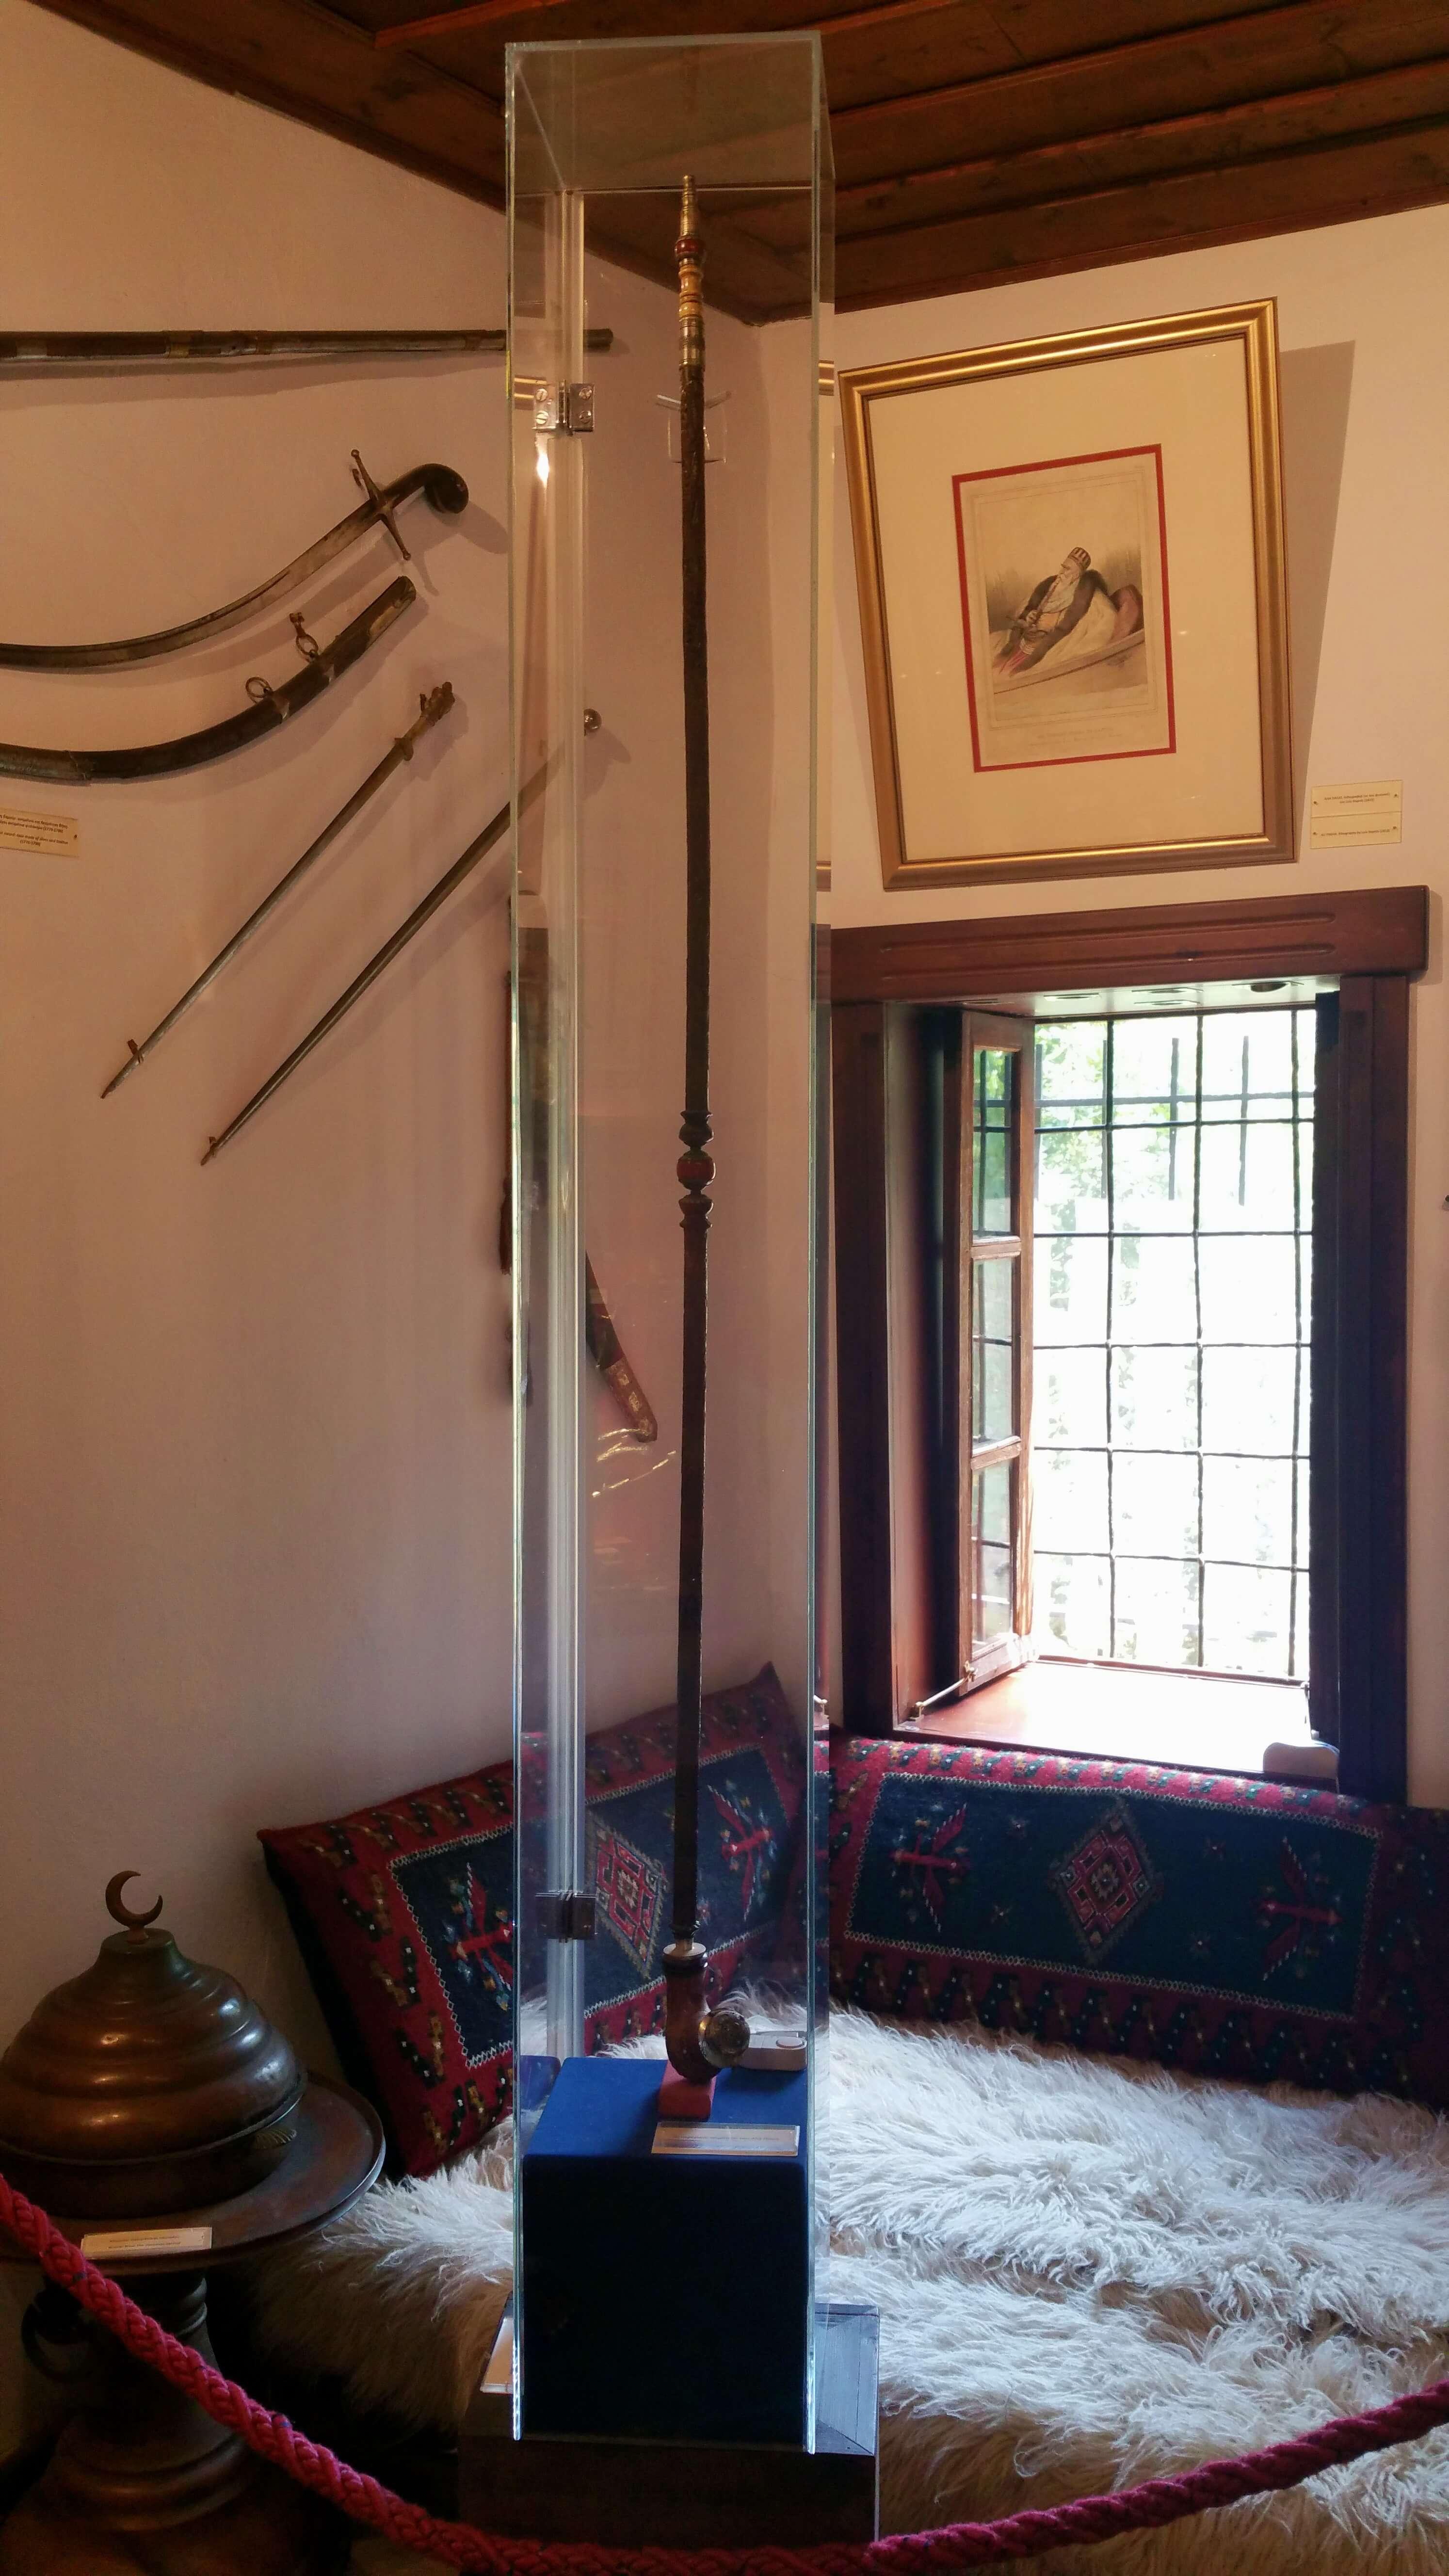 Ali Pasha's long tobacco pipe - Ioannina, Greece | Kicking Back the Pebbles